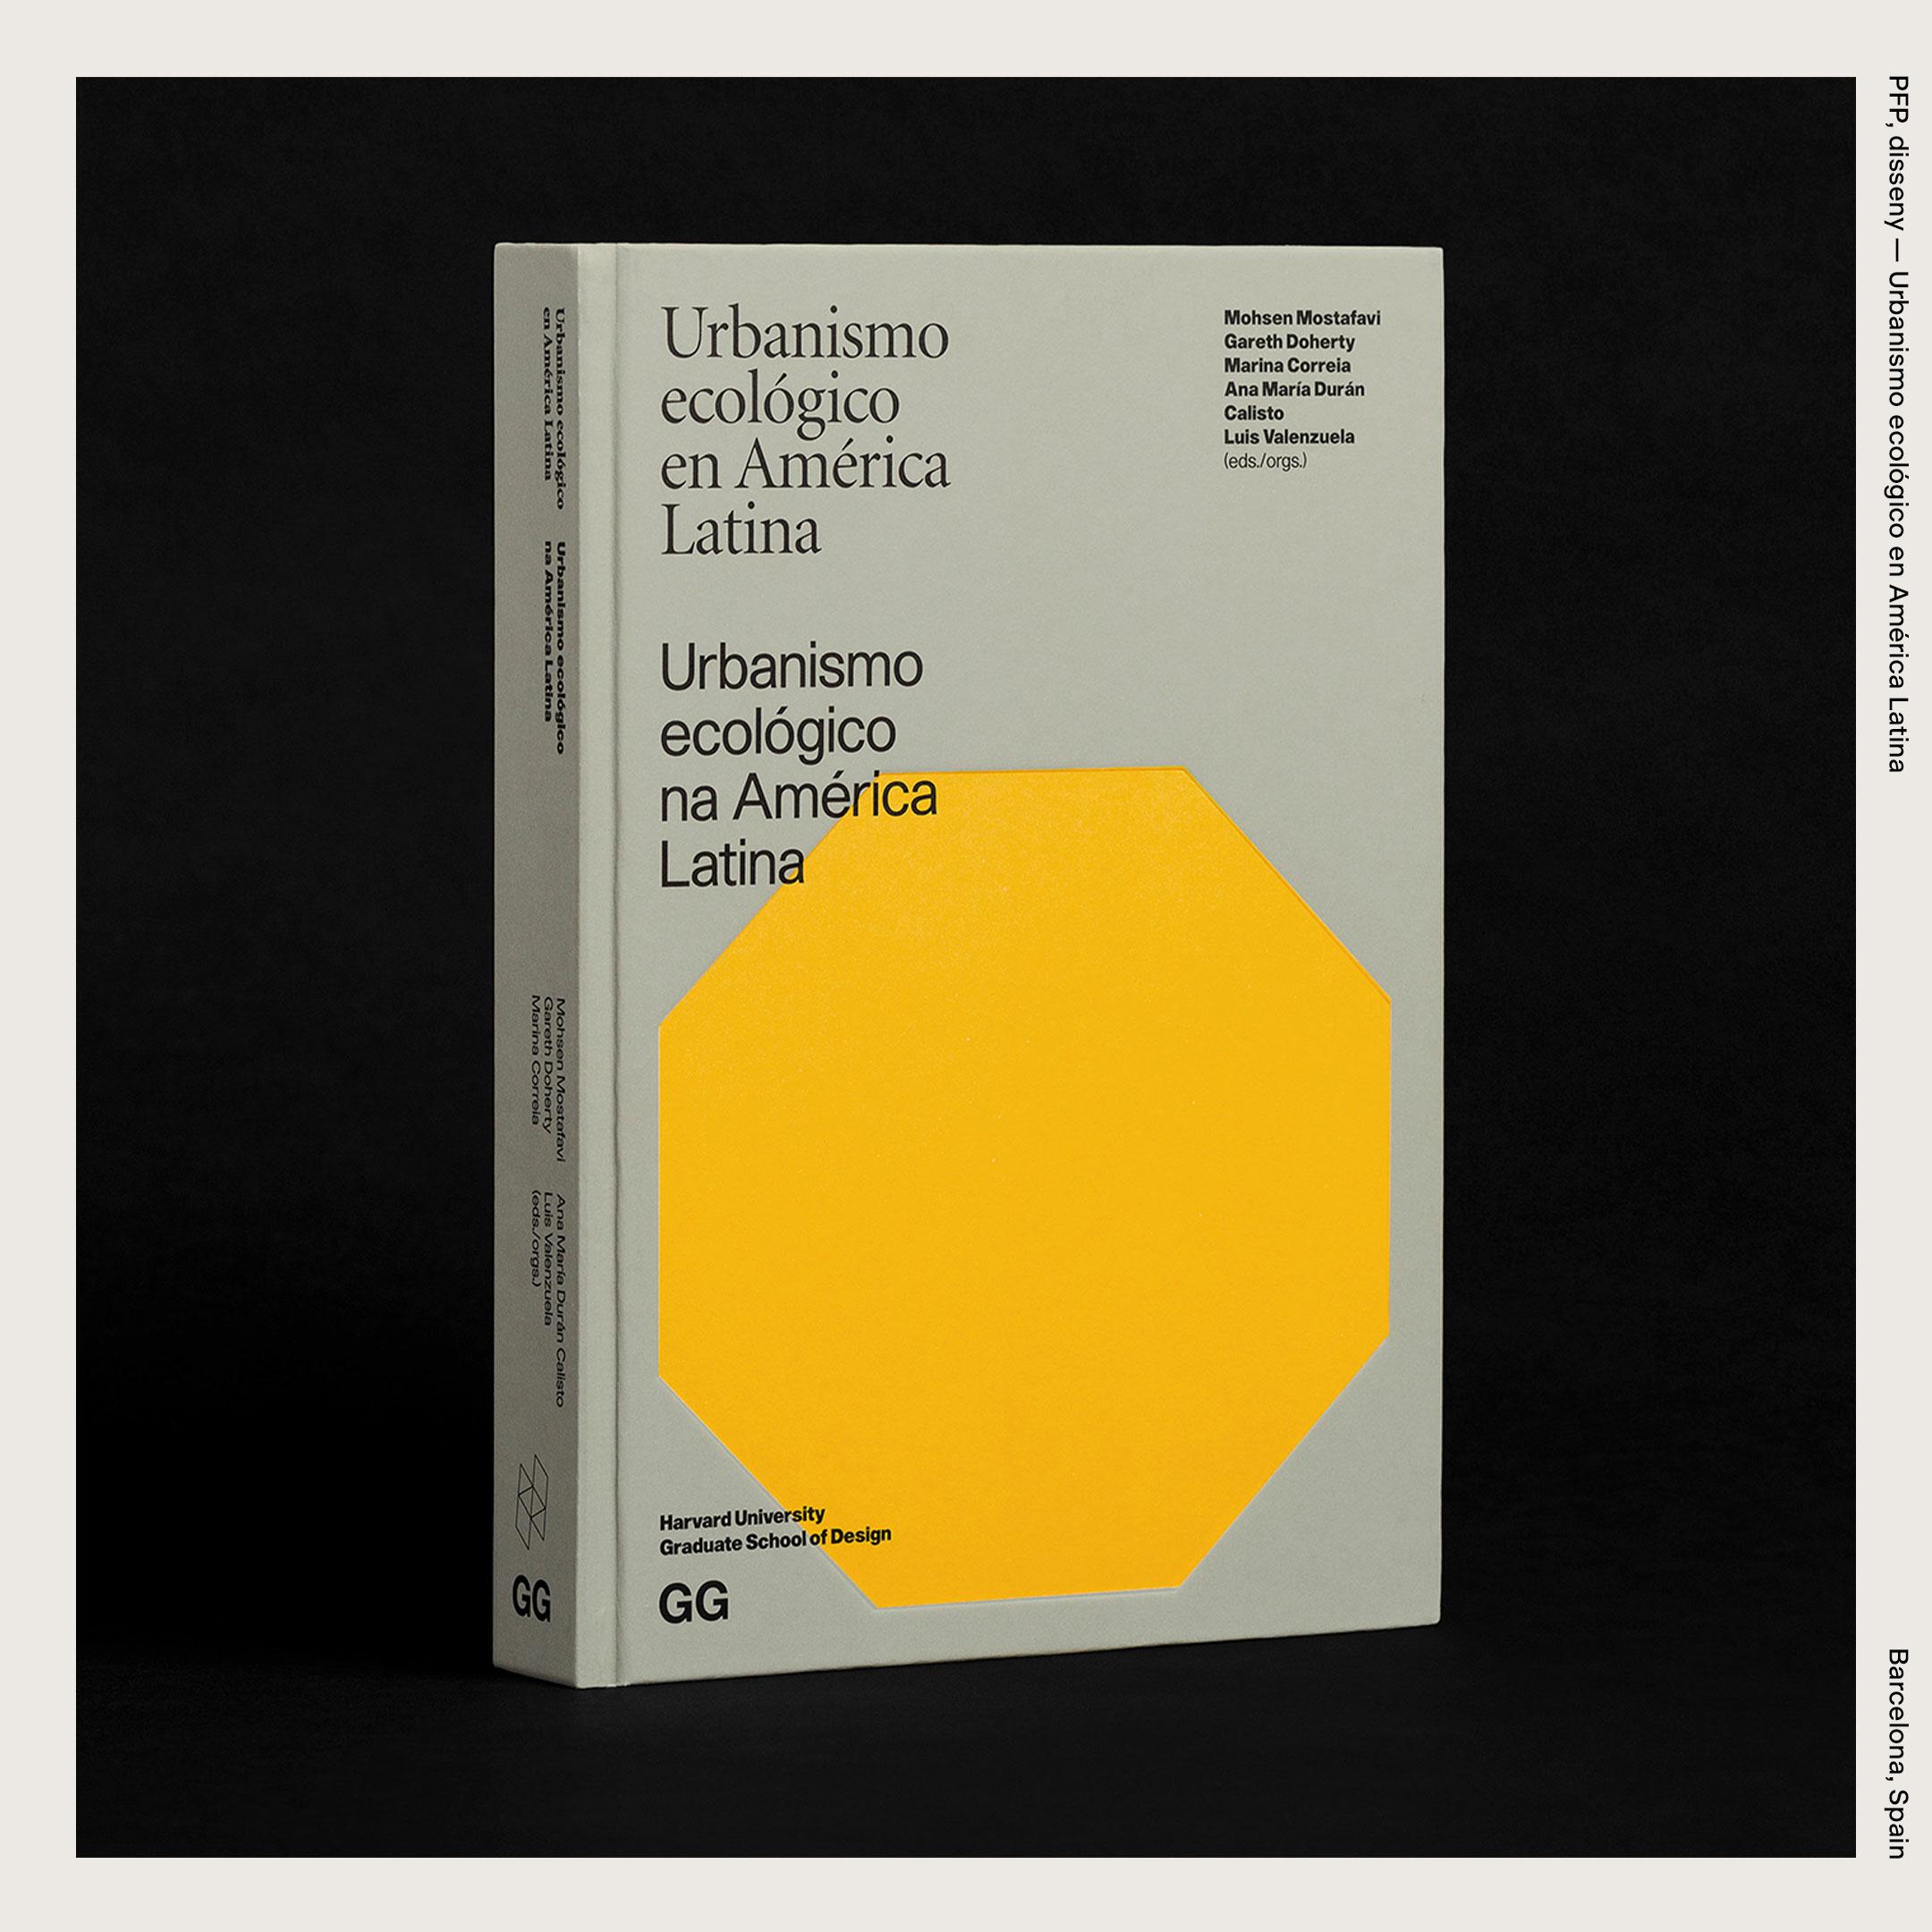 PFP, disseny — Urbanismo ecológico en América Latina